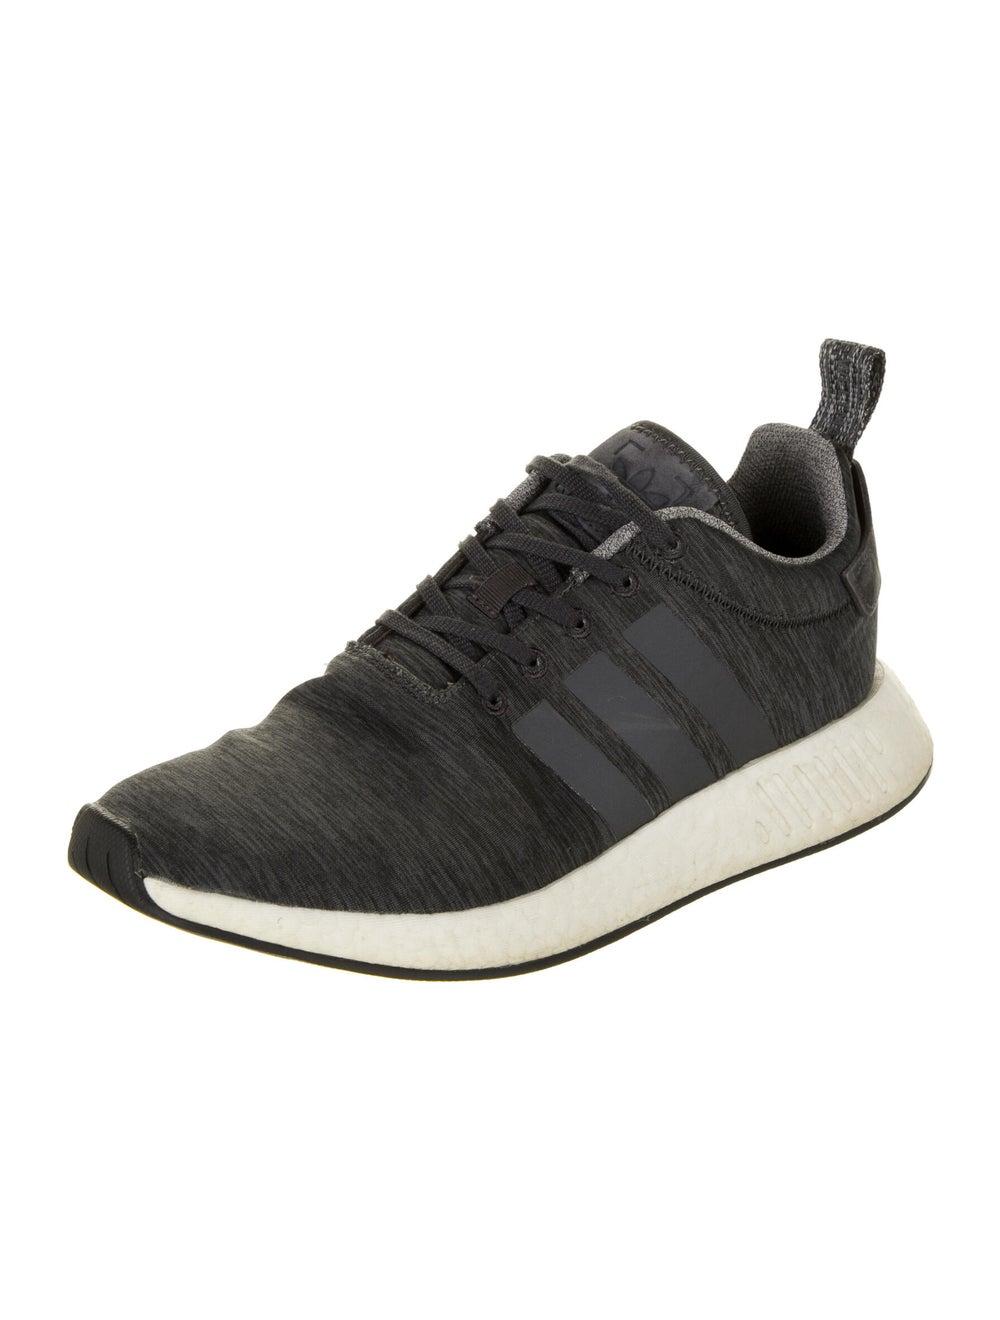 Adidas Athletic Sneakers Grey - image 2